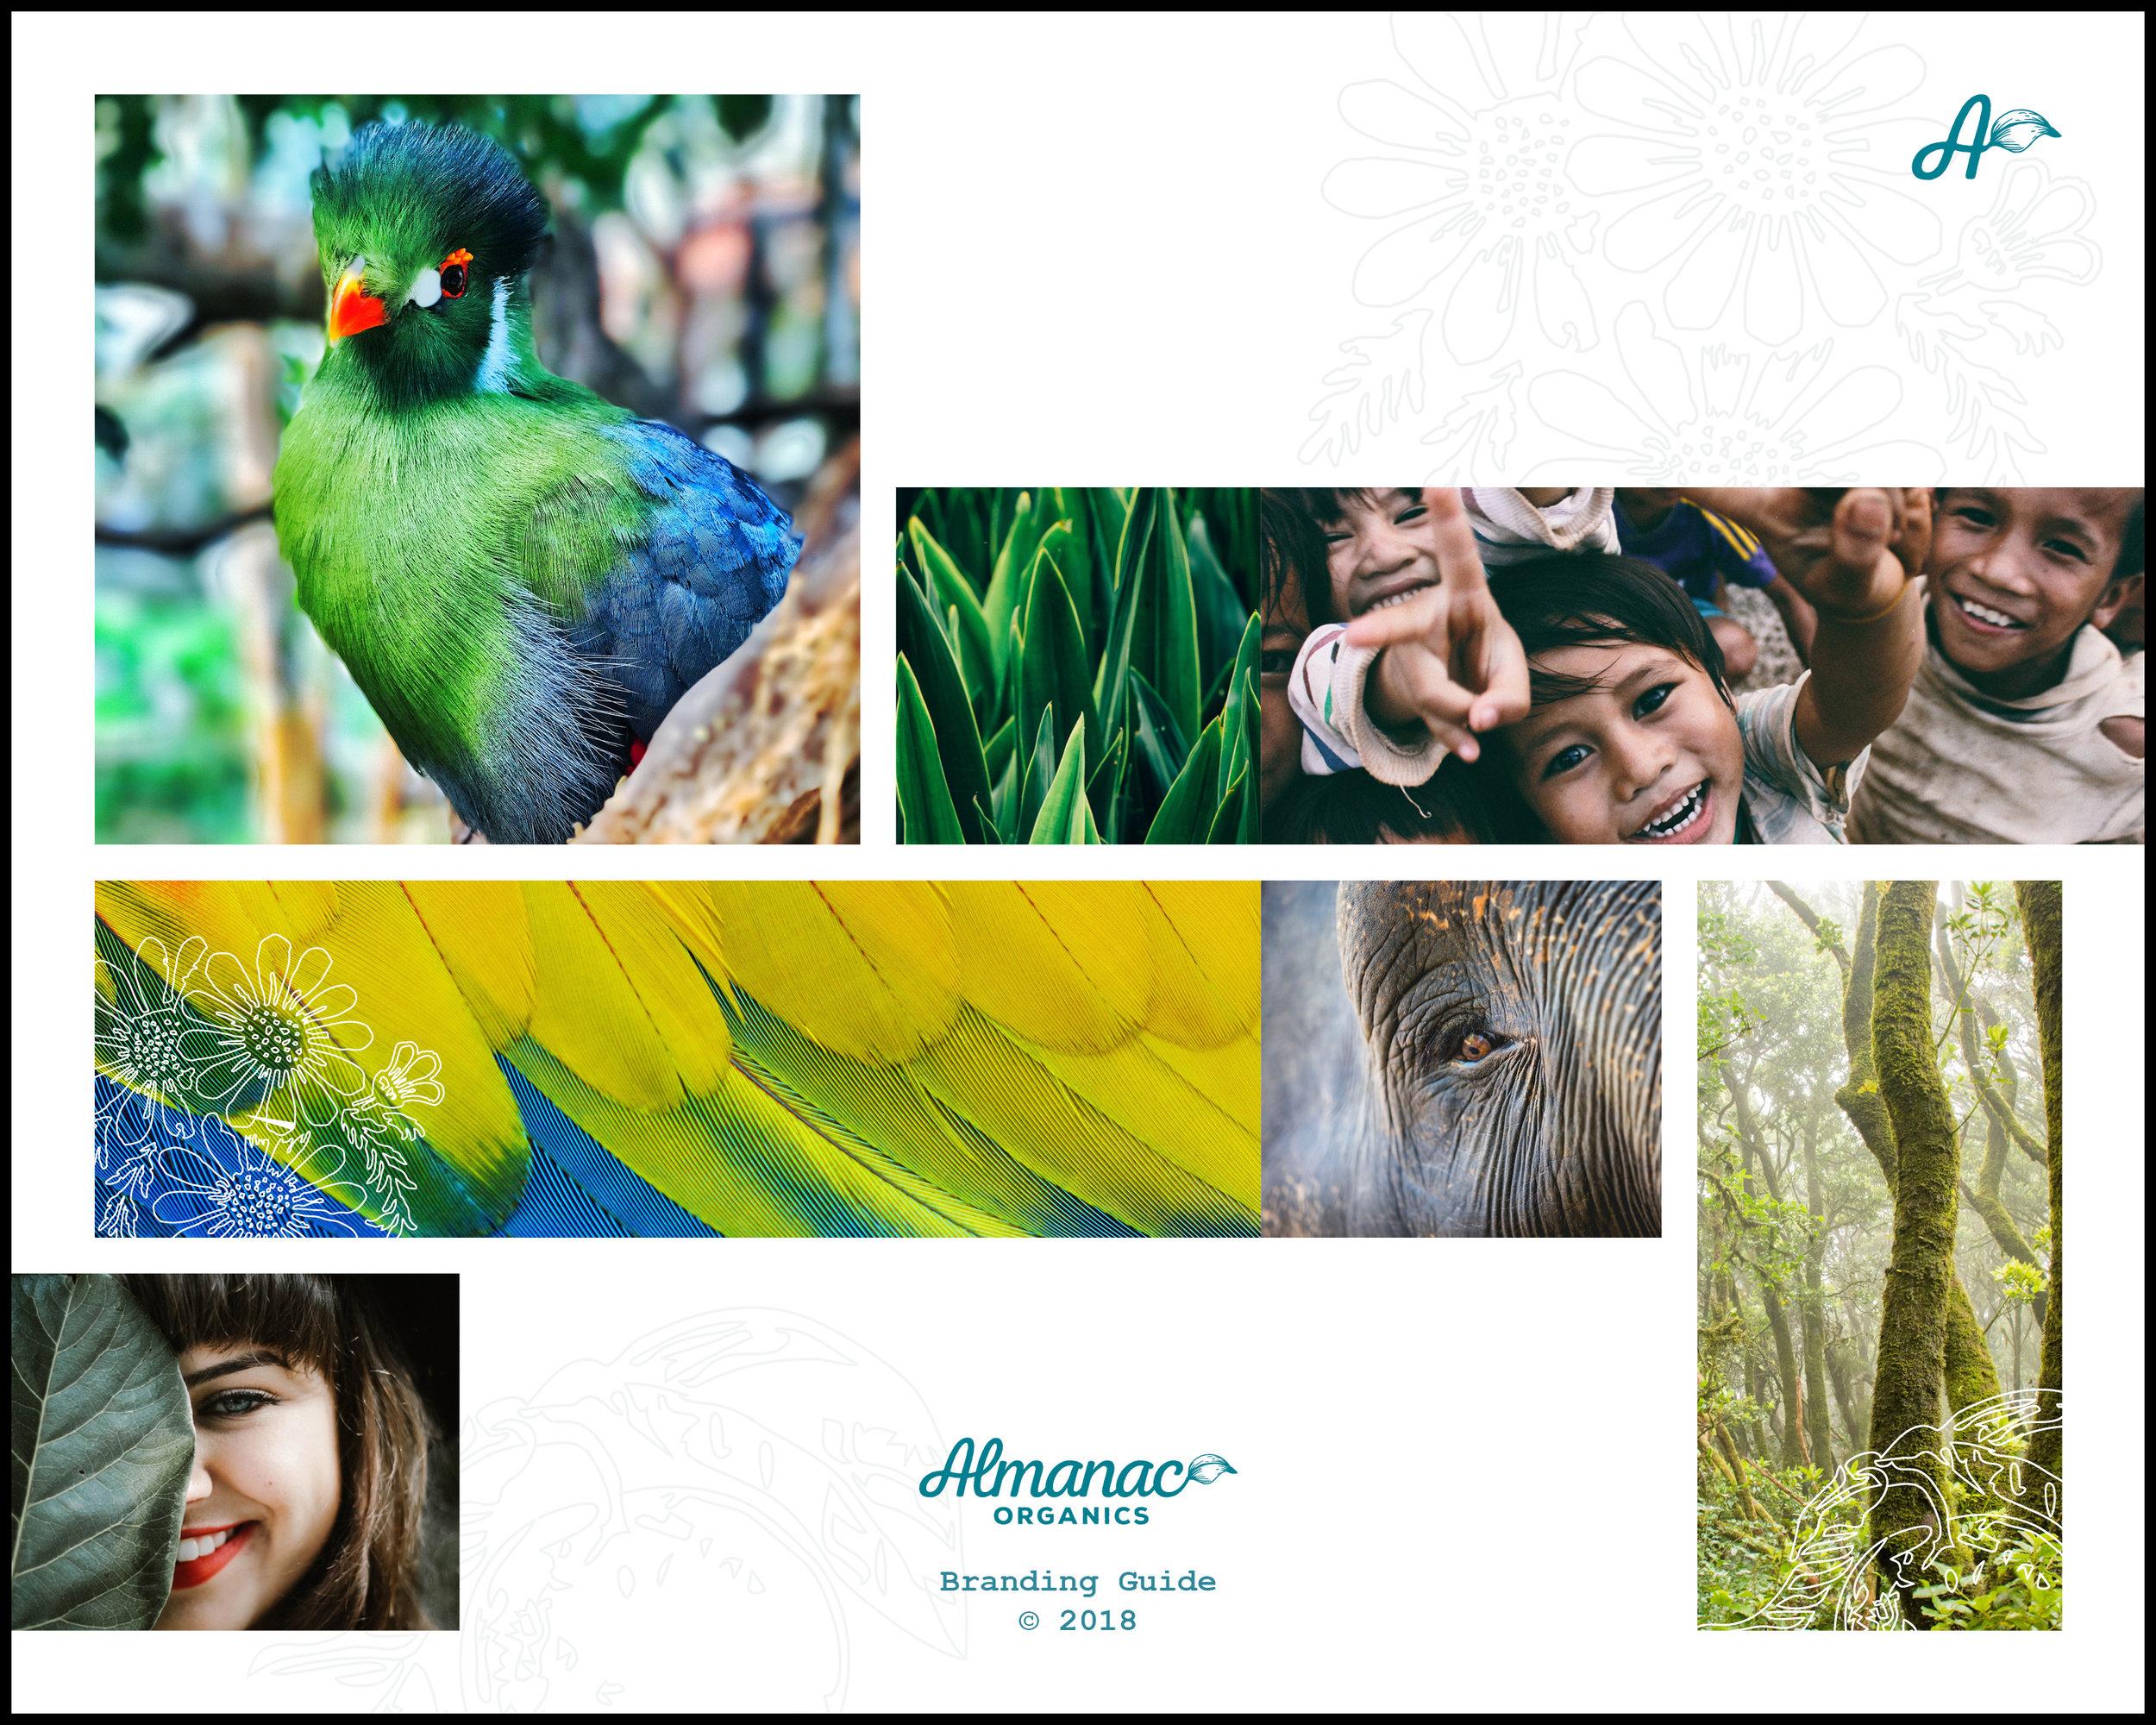 Almanac_Organics_Branding_Guide19.jpg